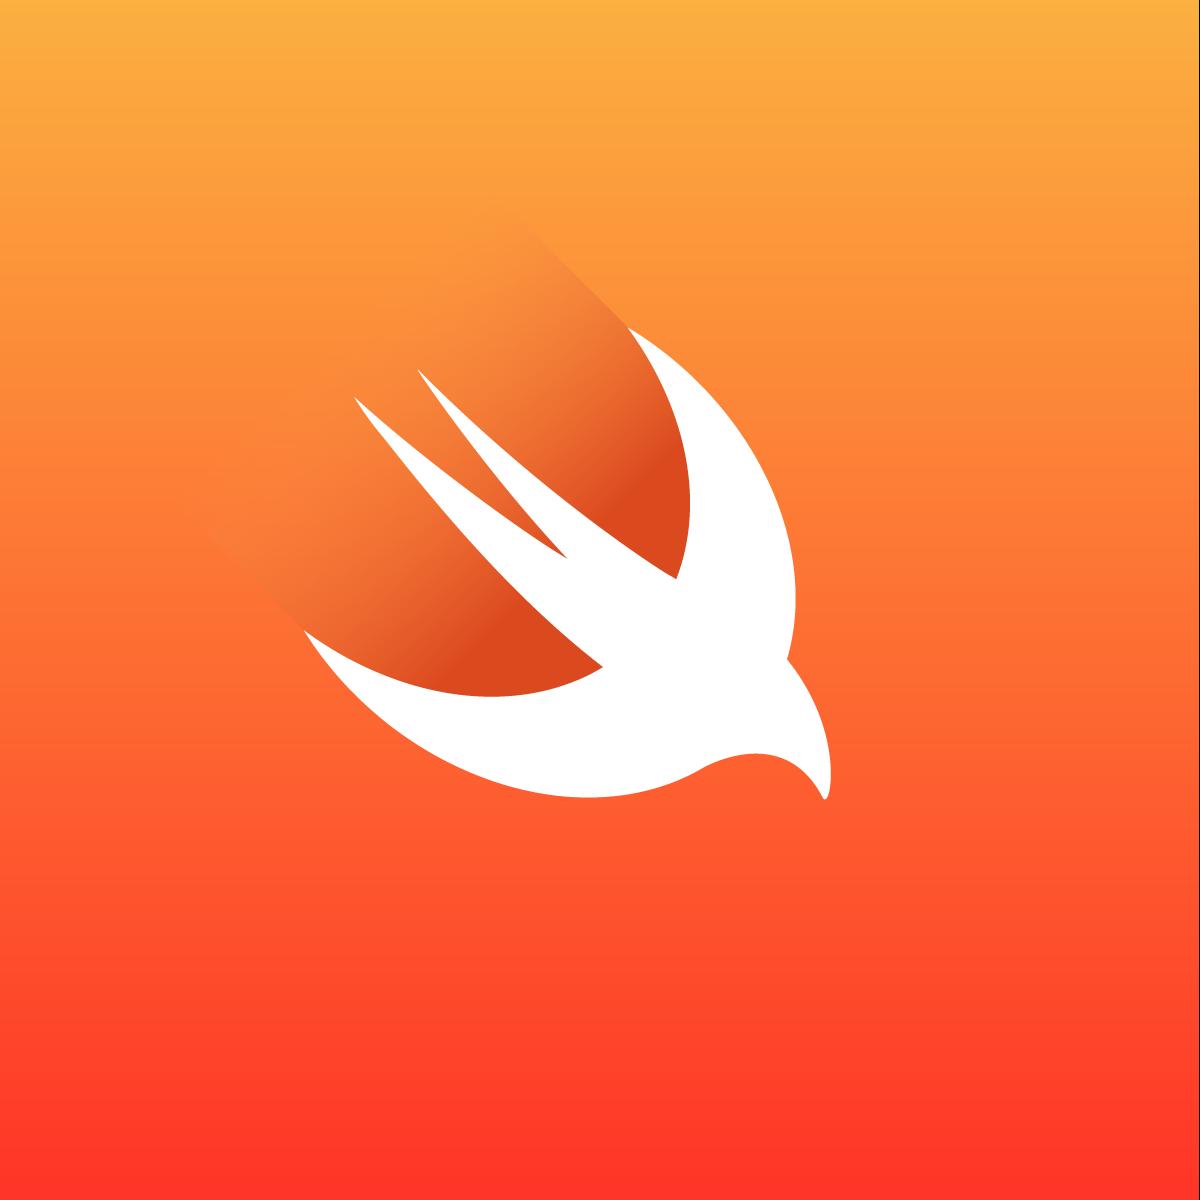 Apple's Swift programming language embraced by Australian educators